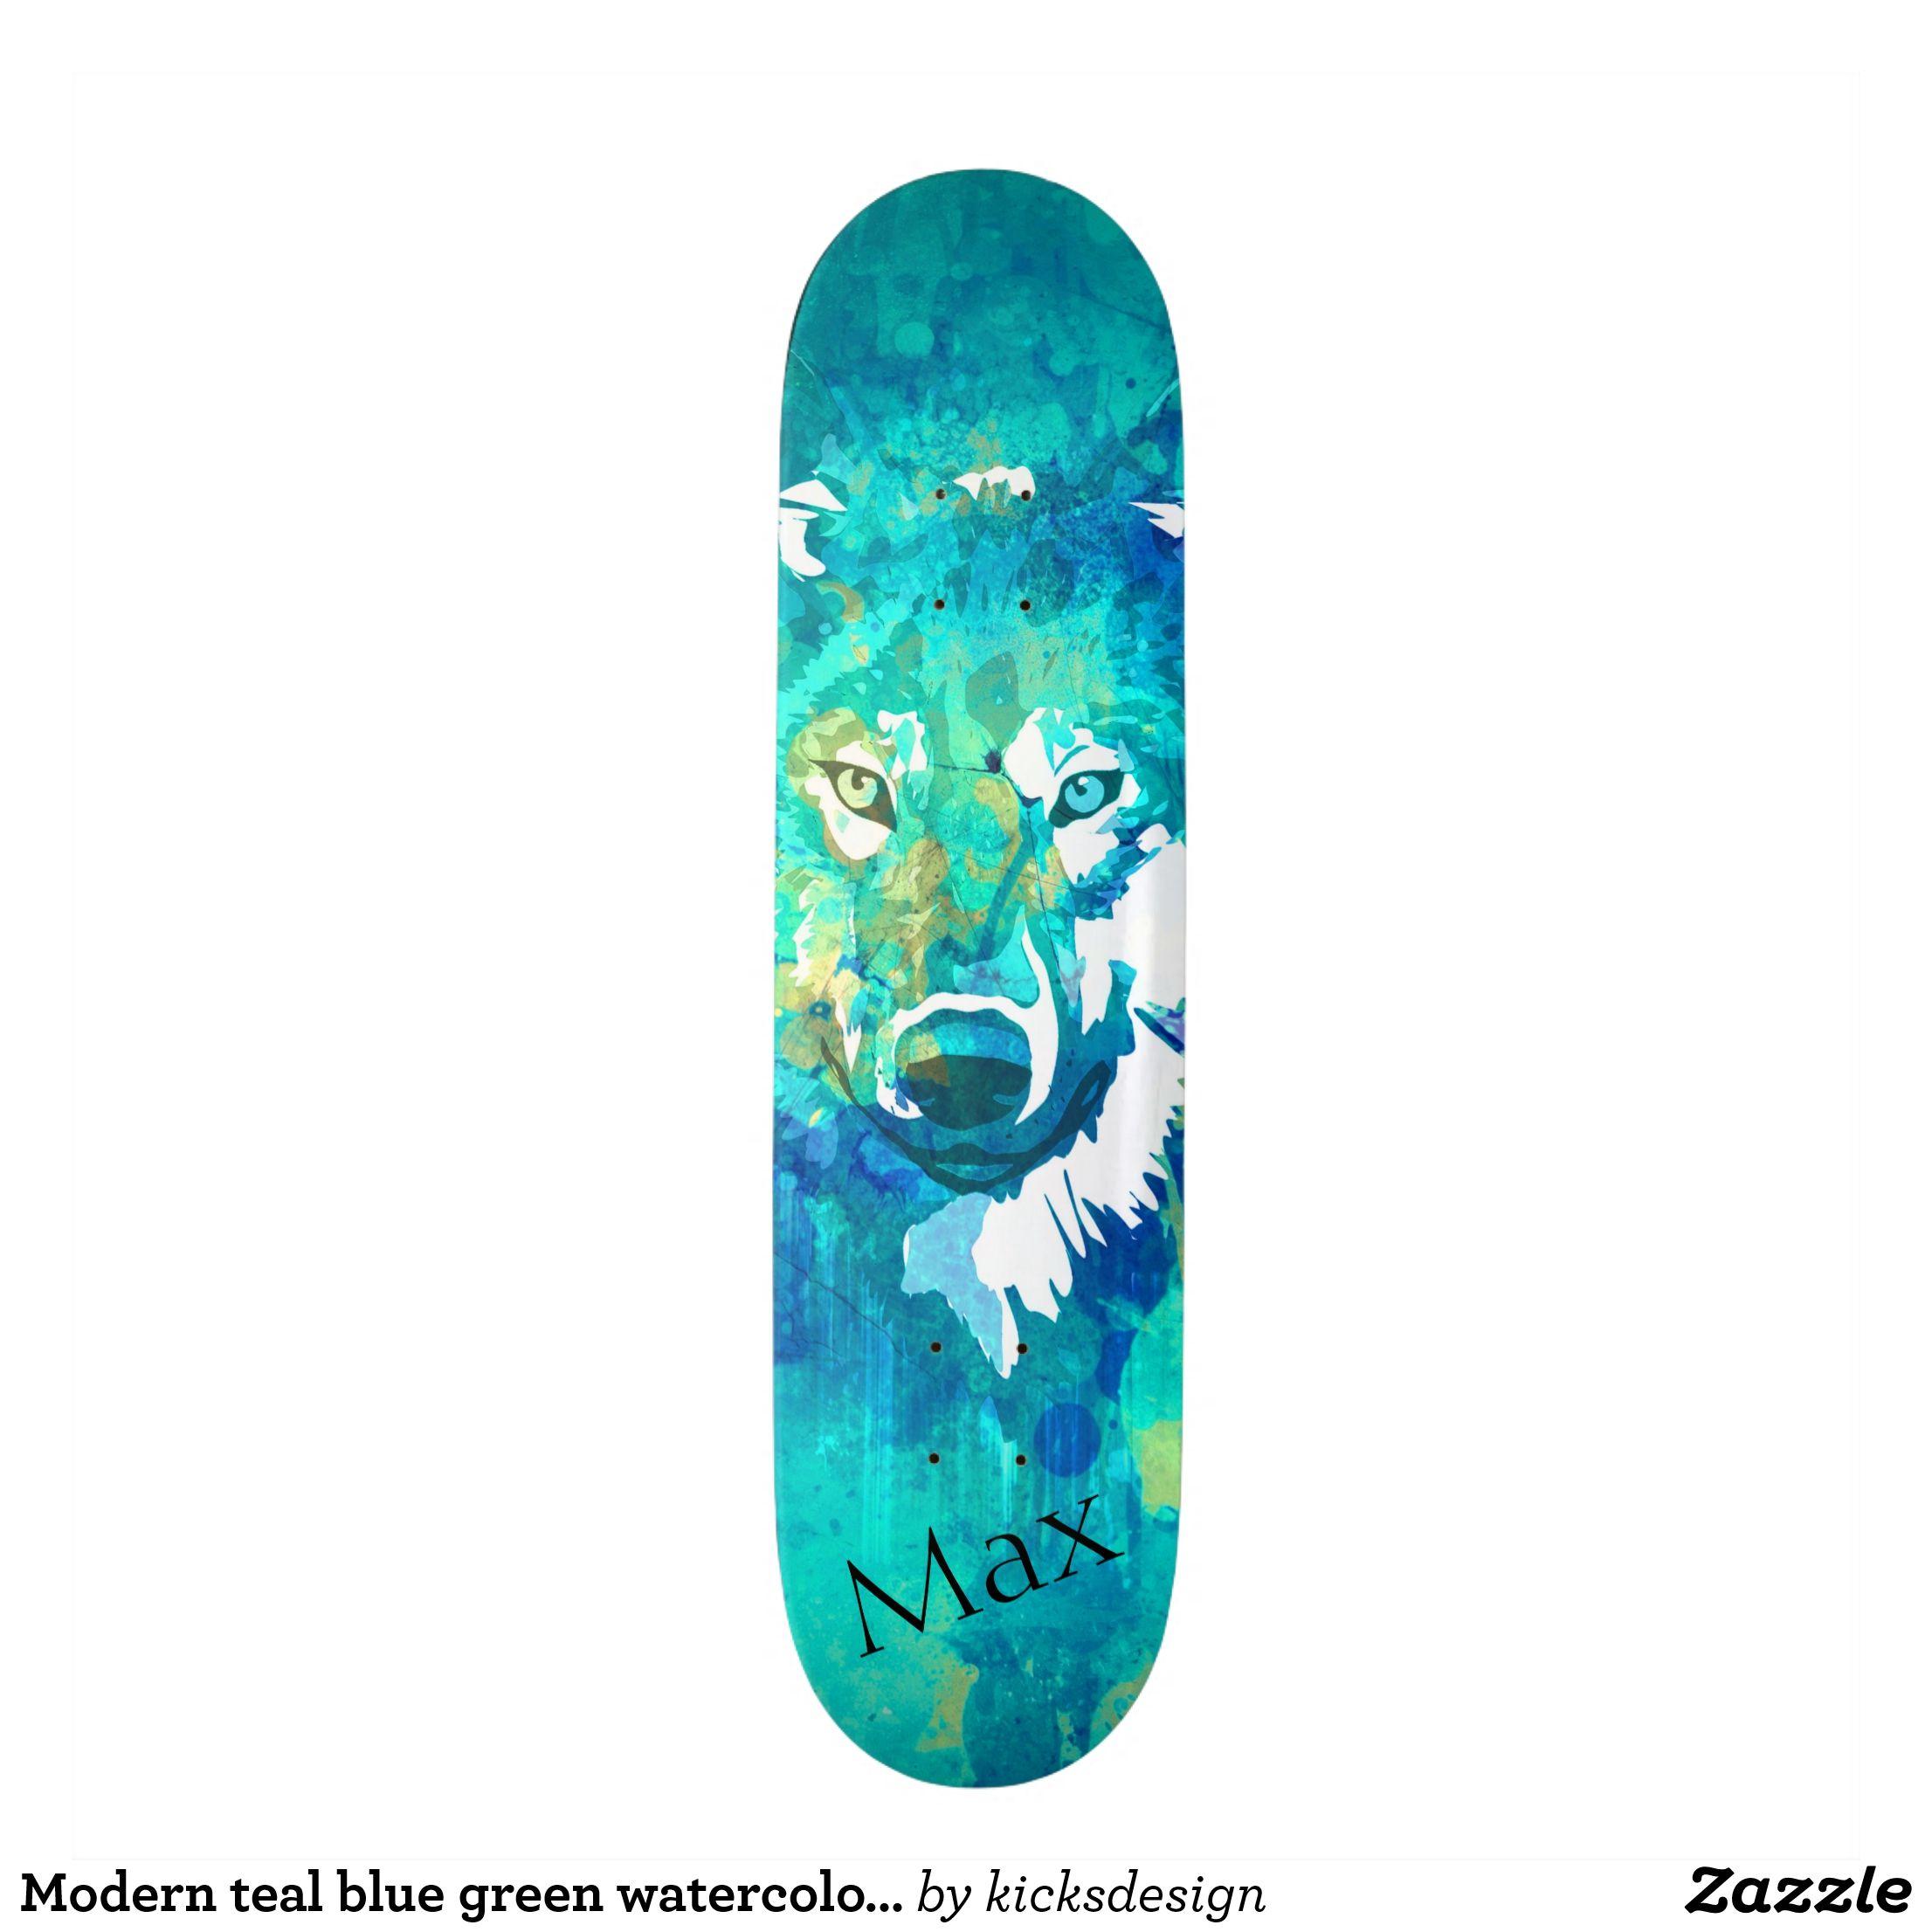 Modern Teal Blue Green Watercolor Wolf Skateboard Zazzle Com Skateboard Art Design Watercolor Wolf Green Watercolor